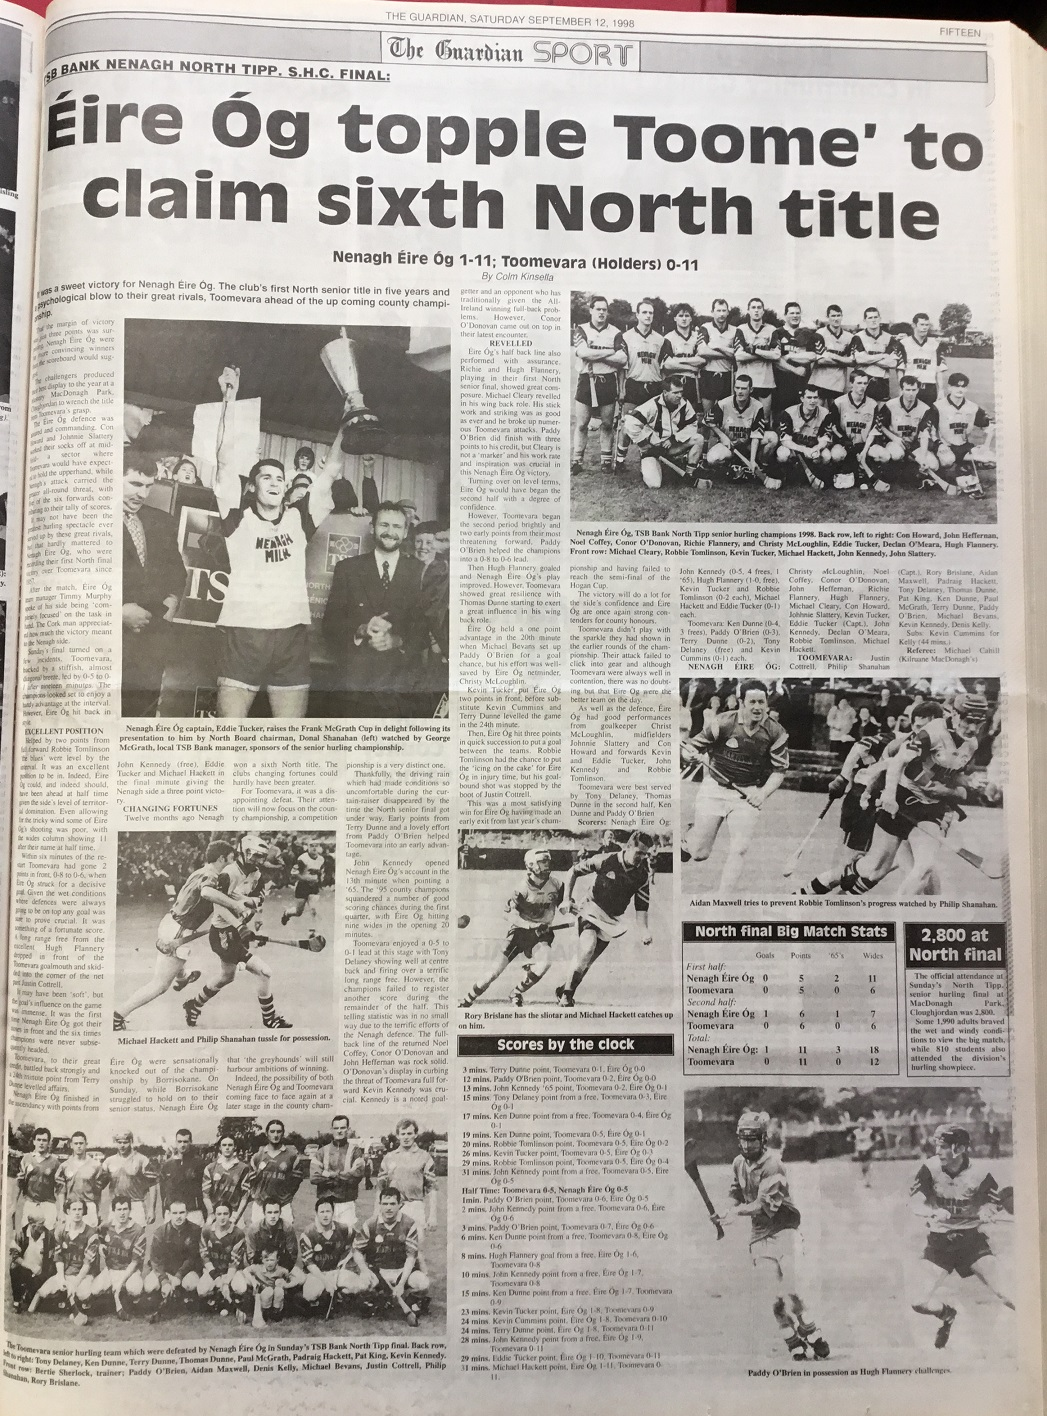 1998 North hurling final